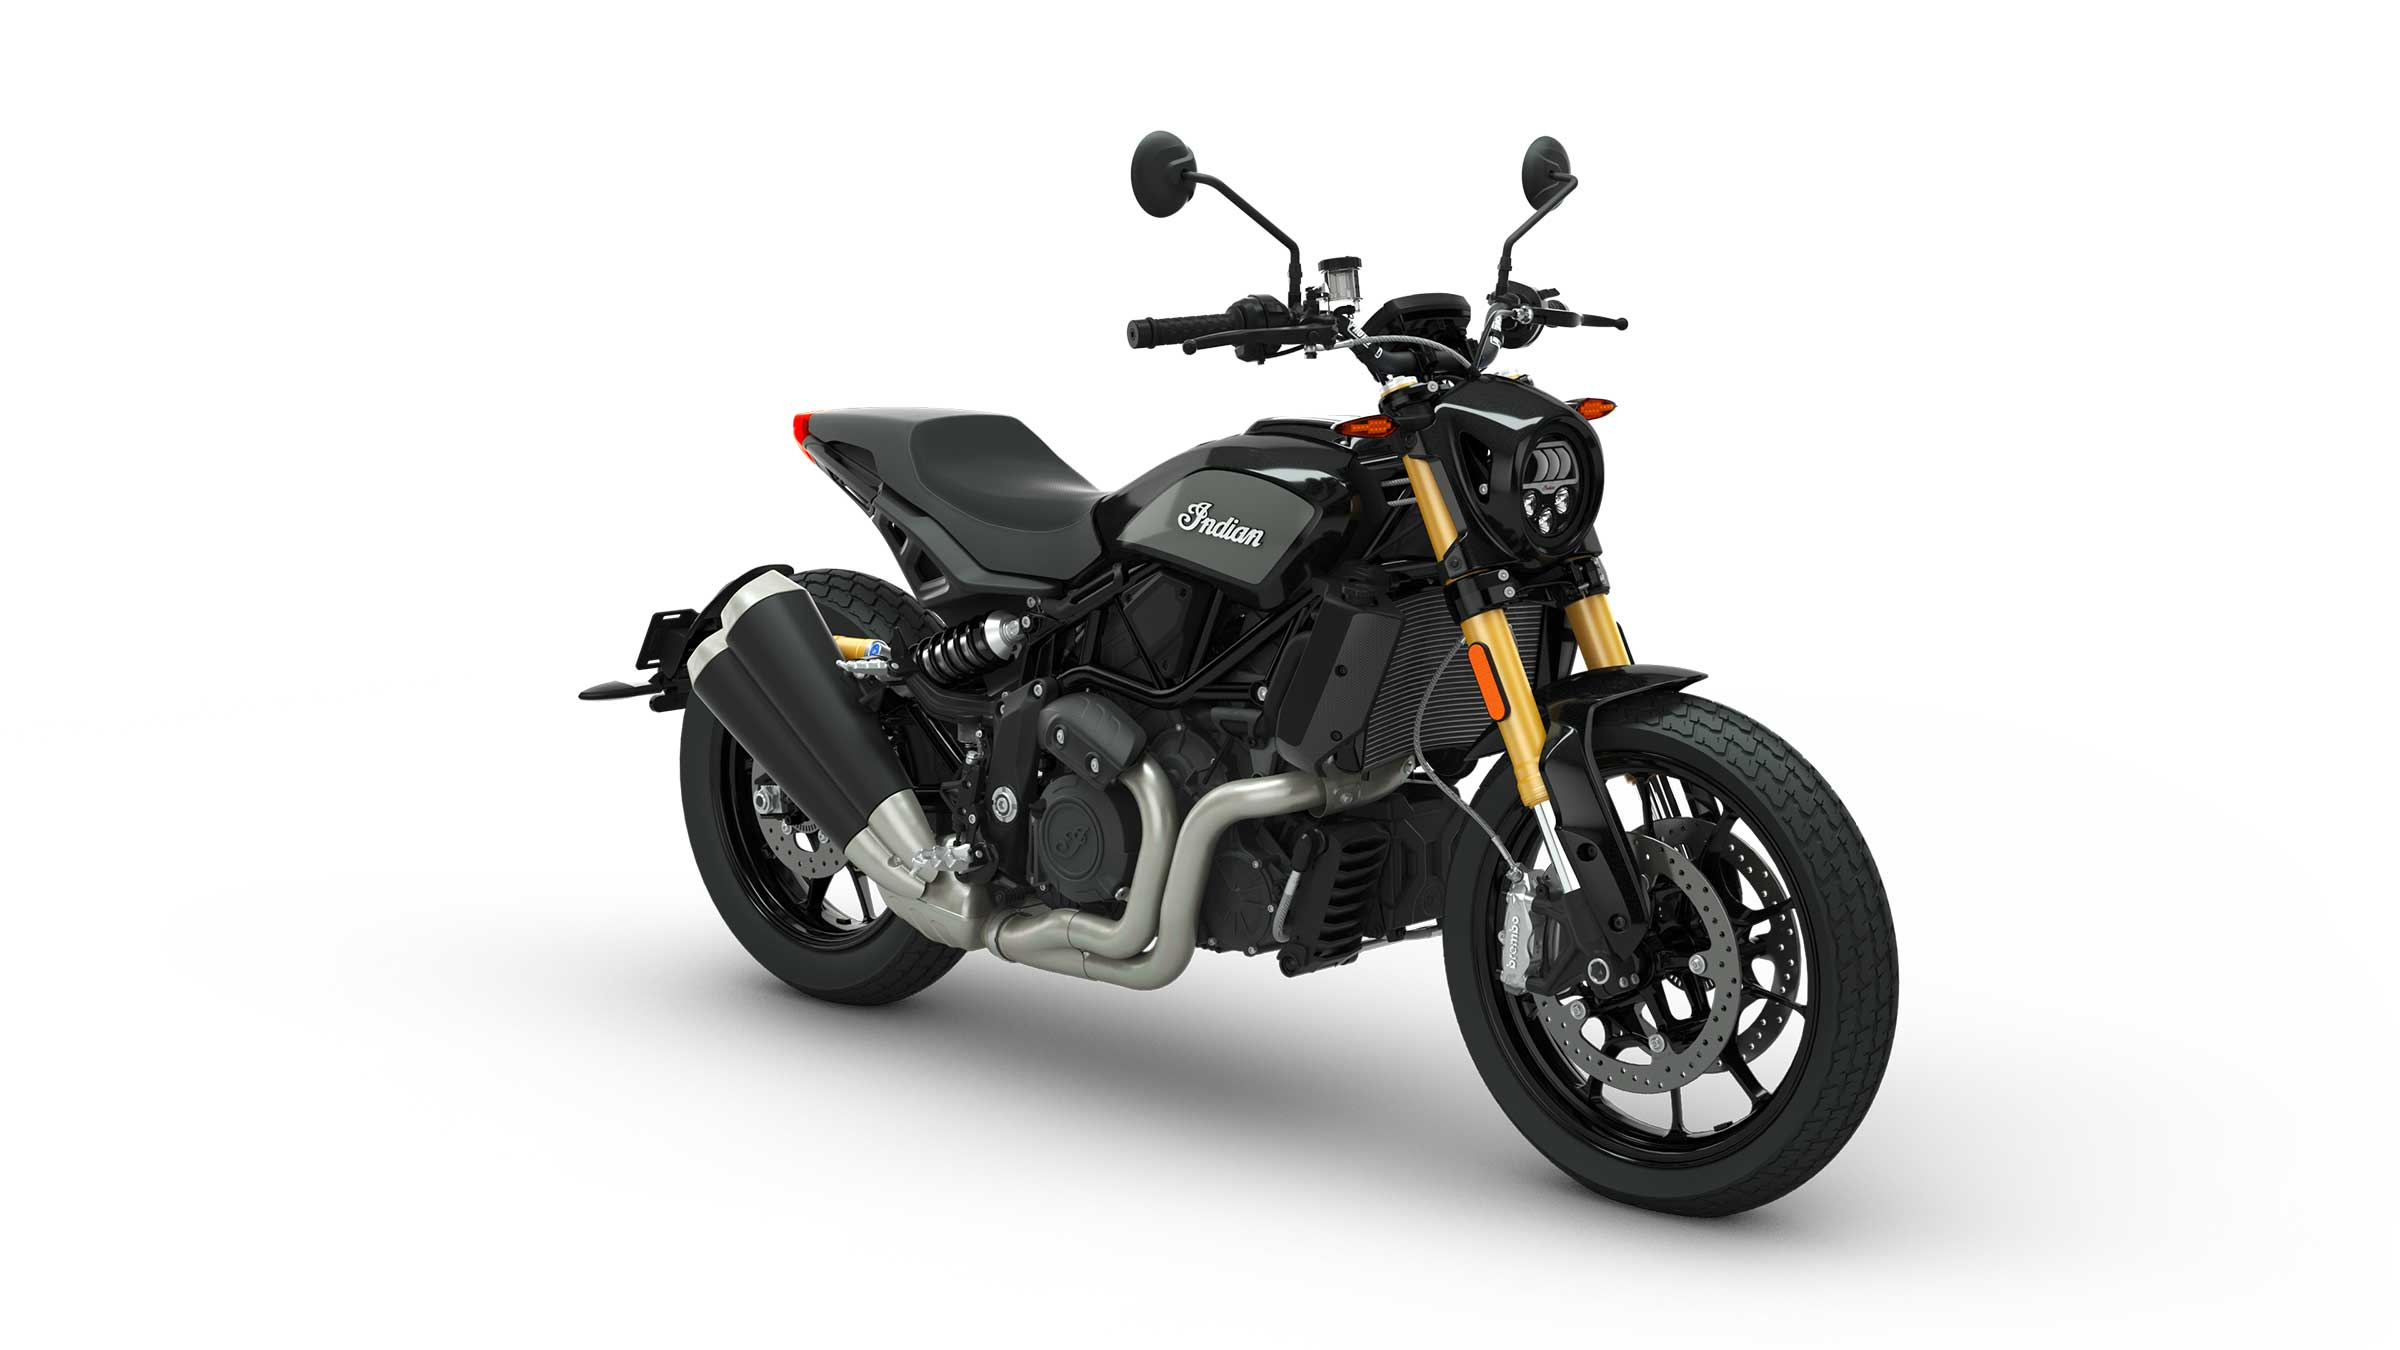 Indian Ftr 1200 >> Ftr 1200 S Indian Ftr Indian Moottoripyorat Bike